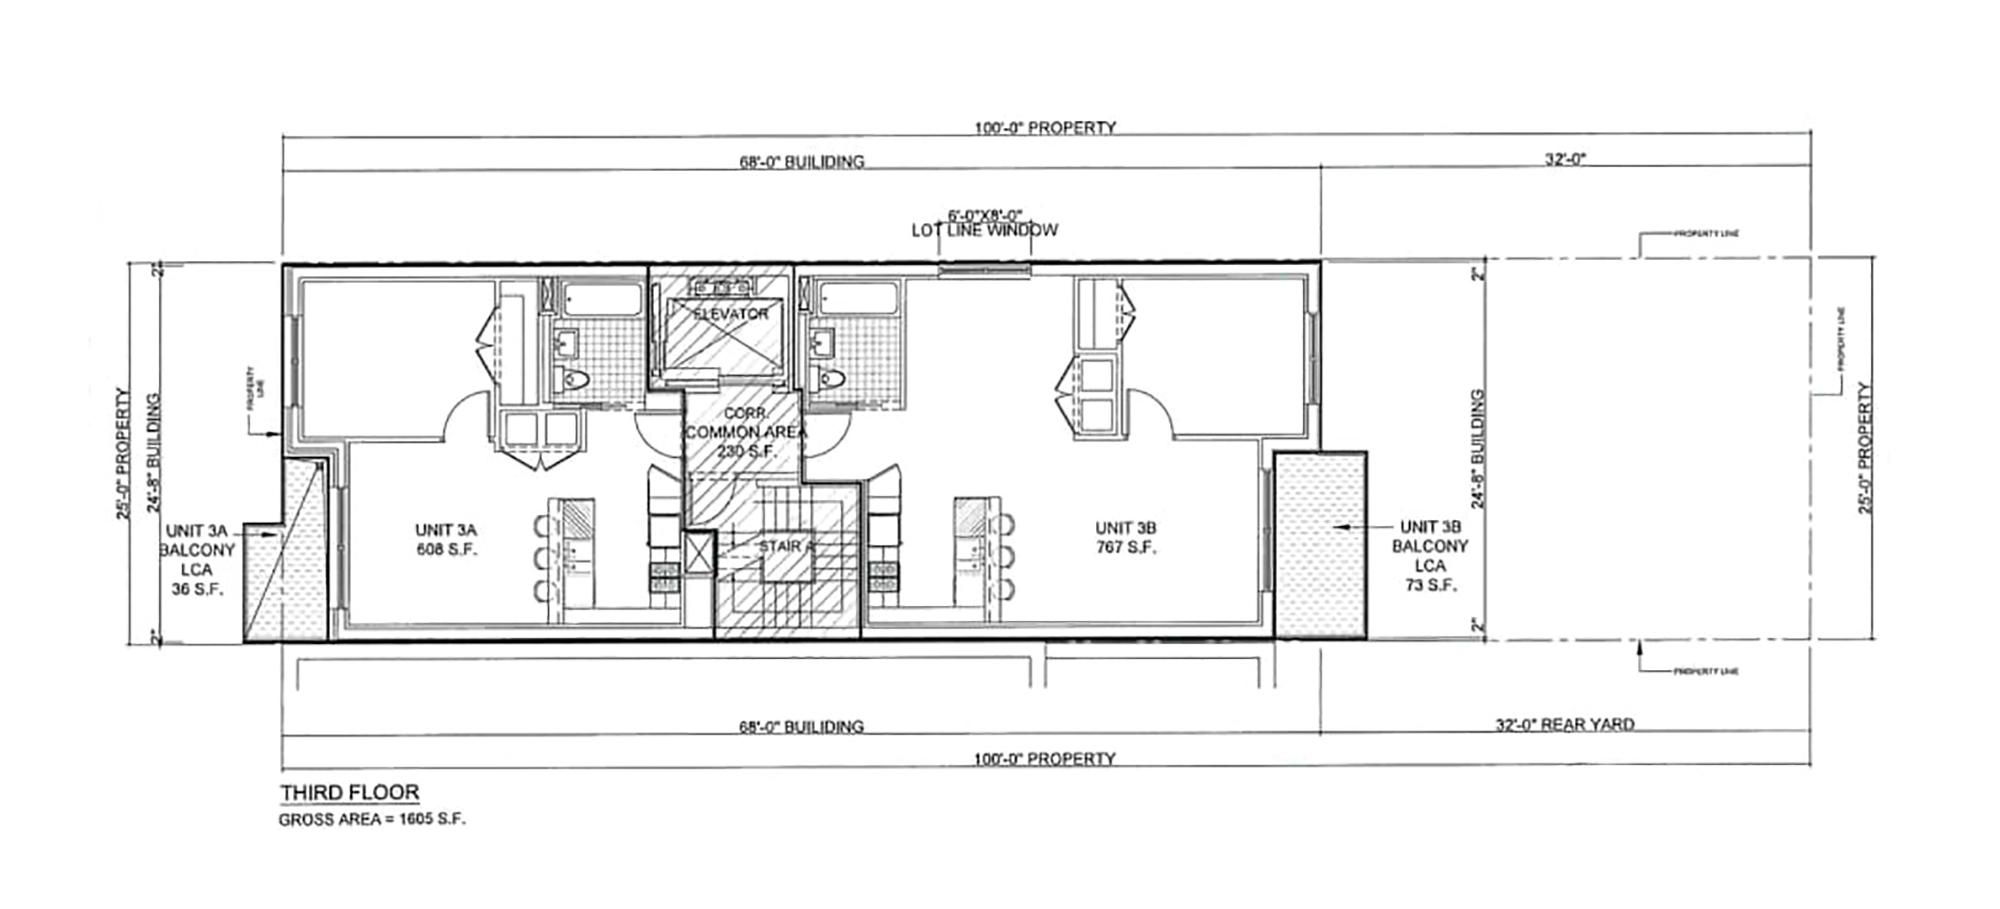 Floor plan - 3rd FL